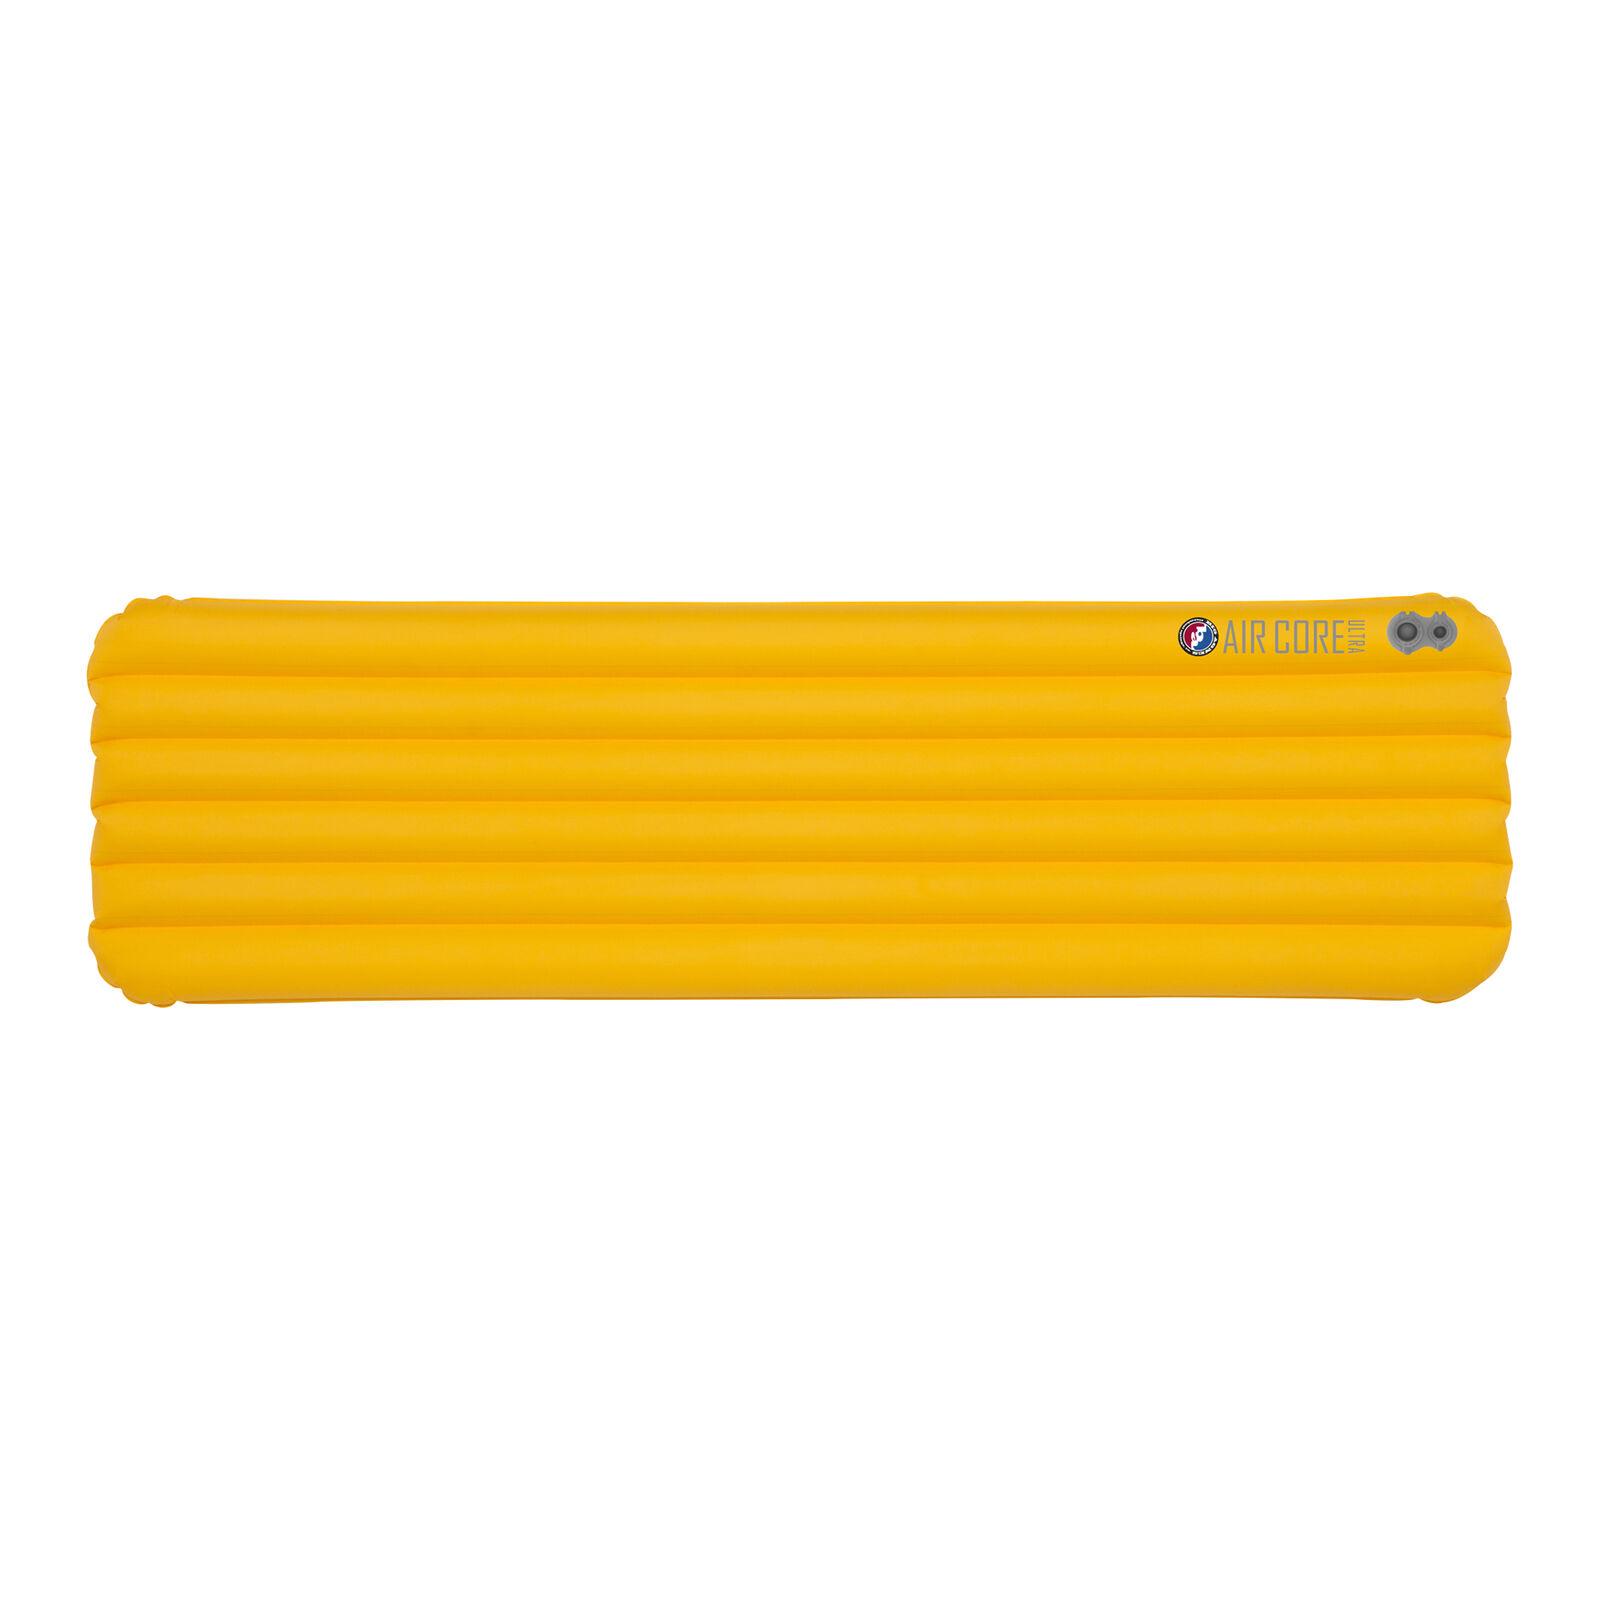 Big Agnes Air Core Ultra Sleeping Pad guld Reguljärt (20x72)